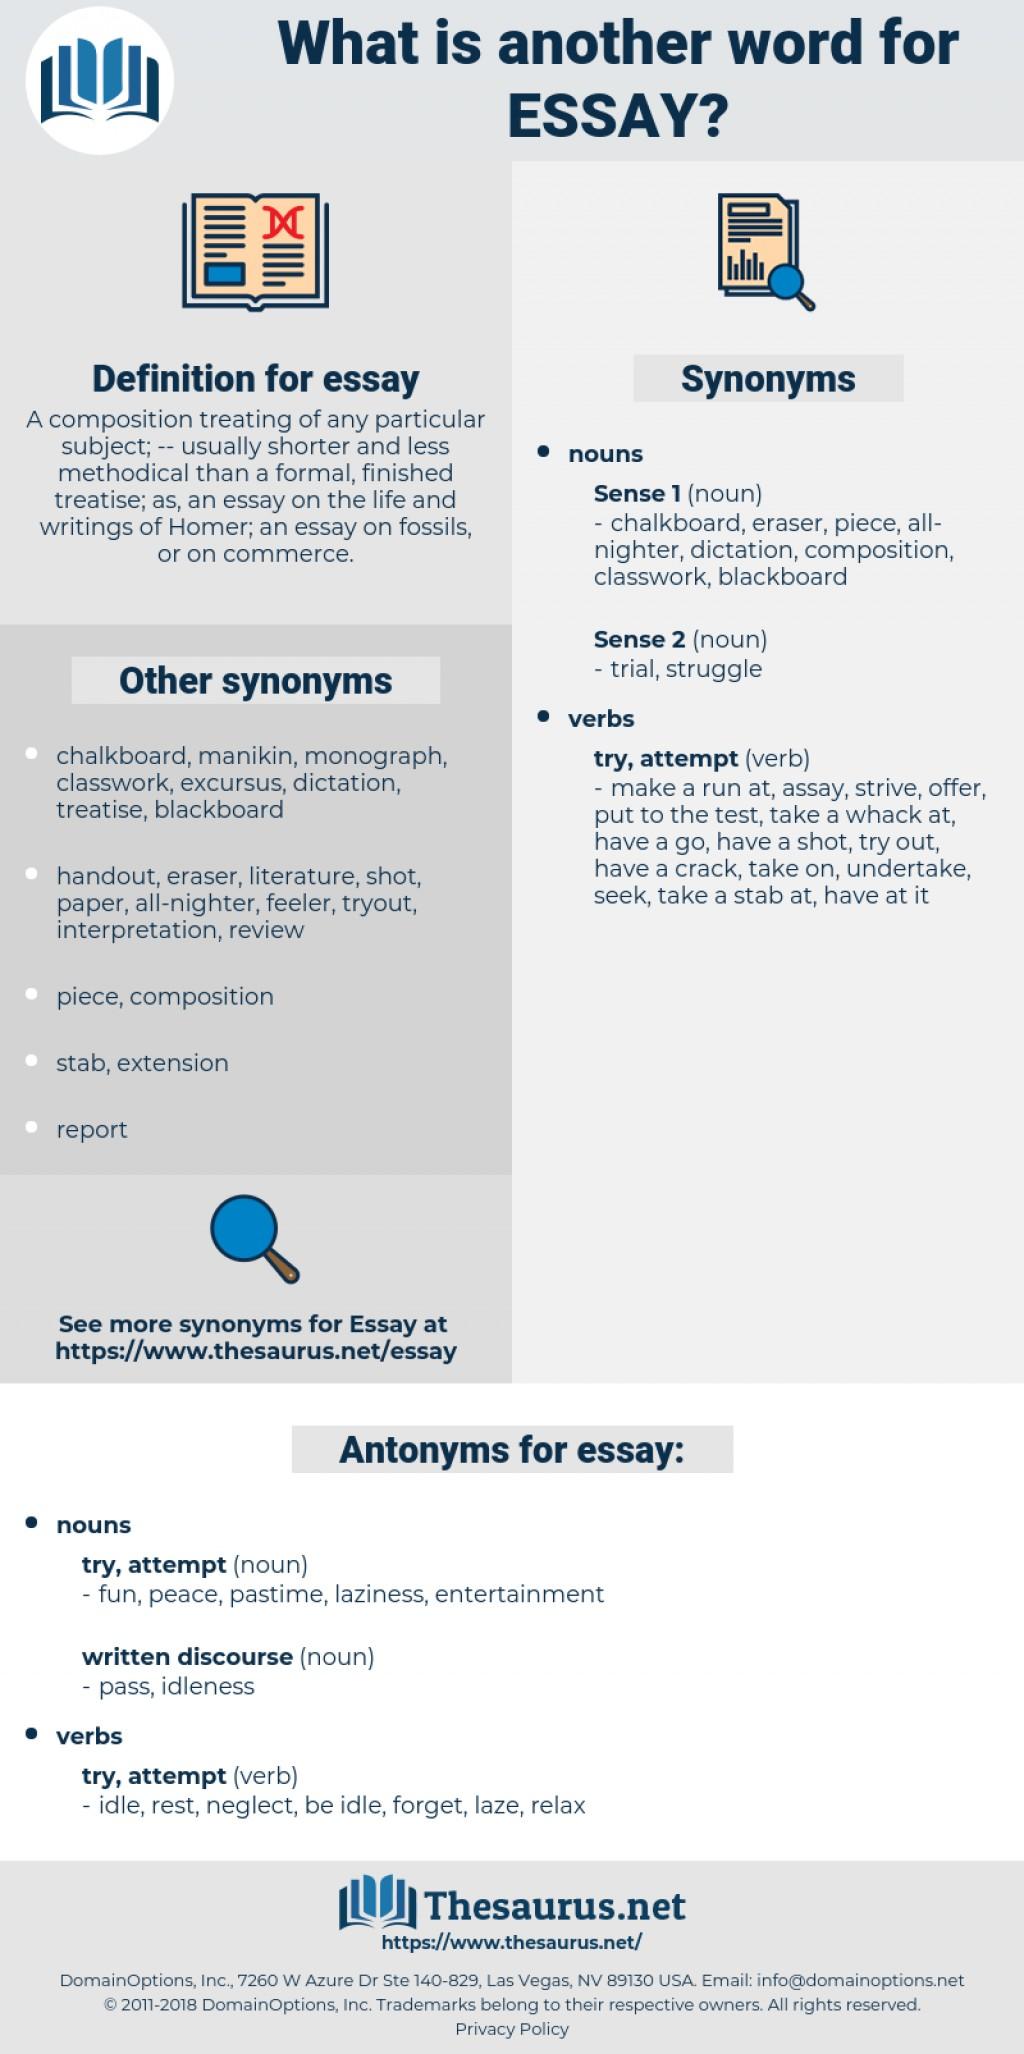 008 Essay Synonym For Frightening Words Essayistisch Because Large